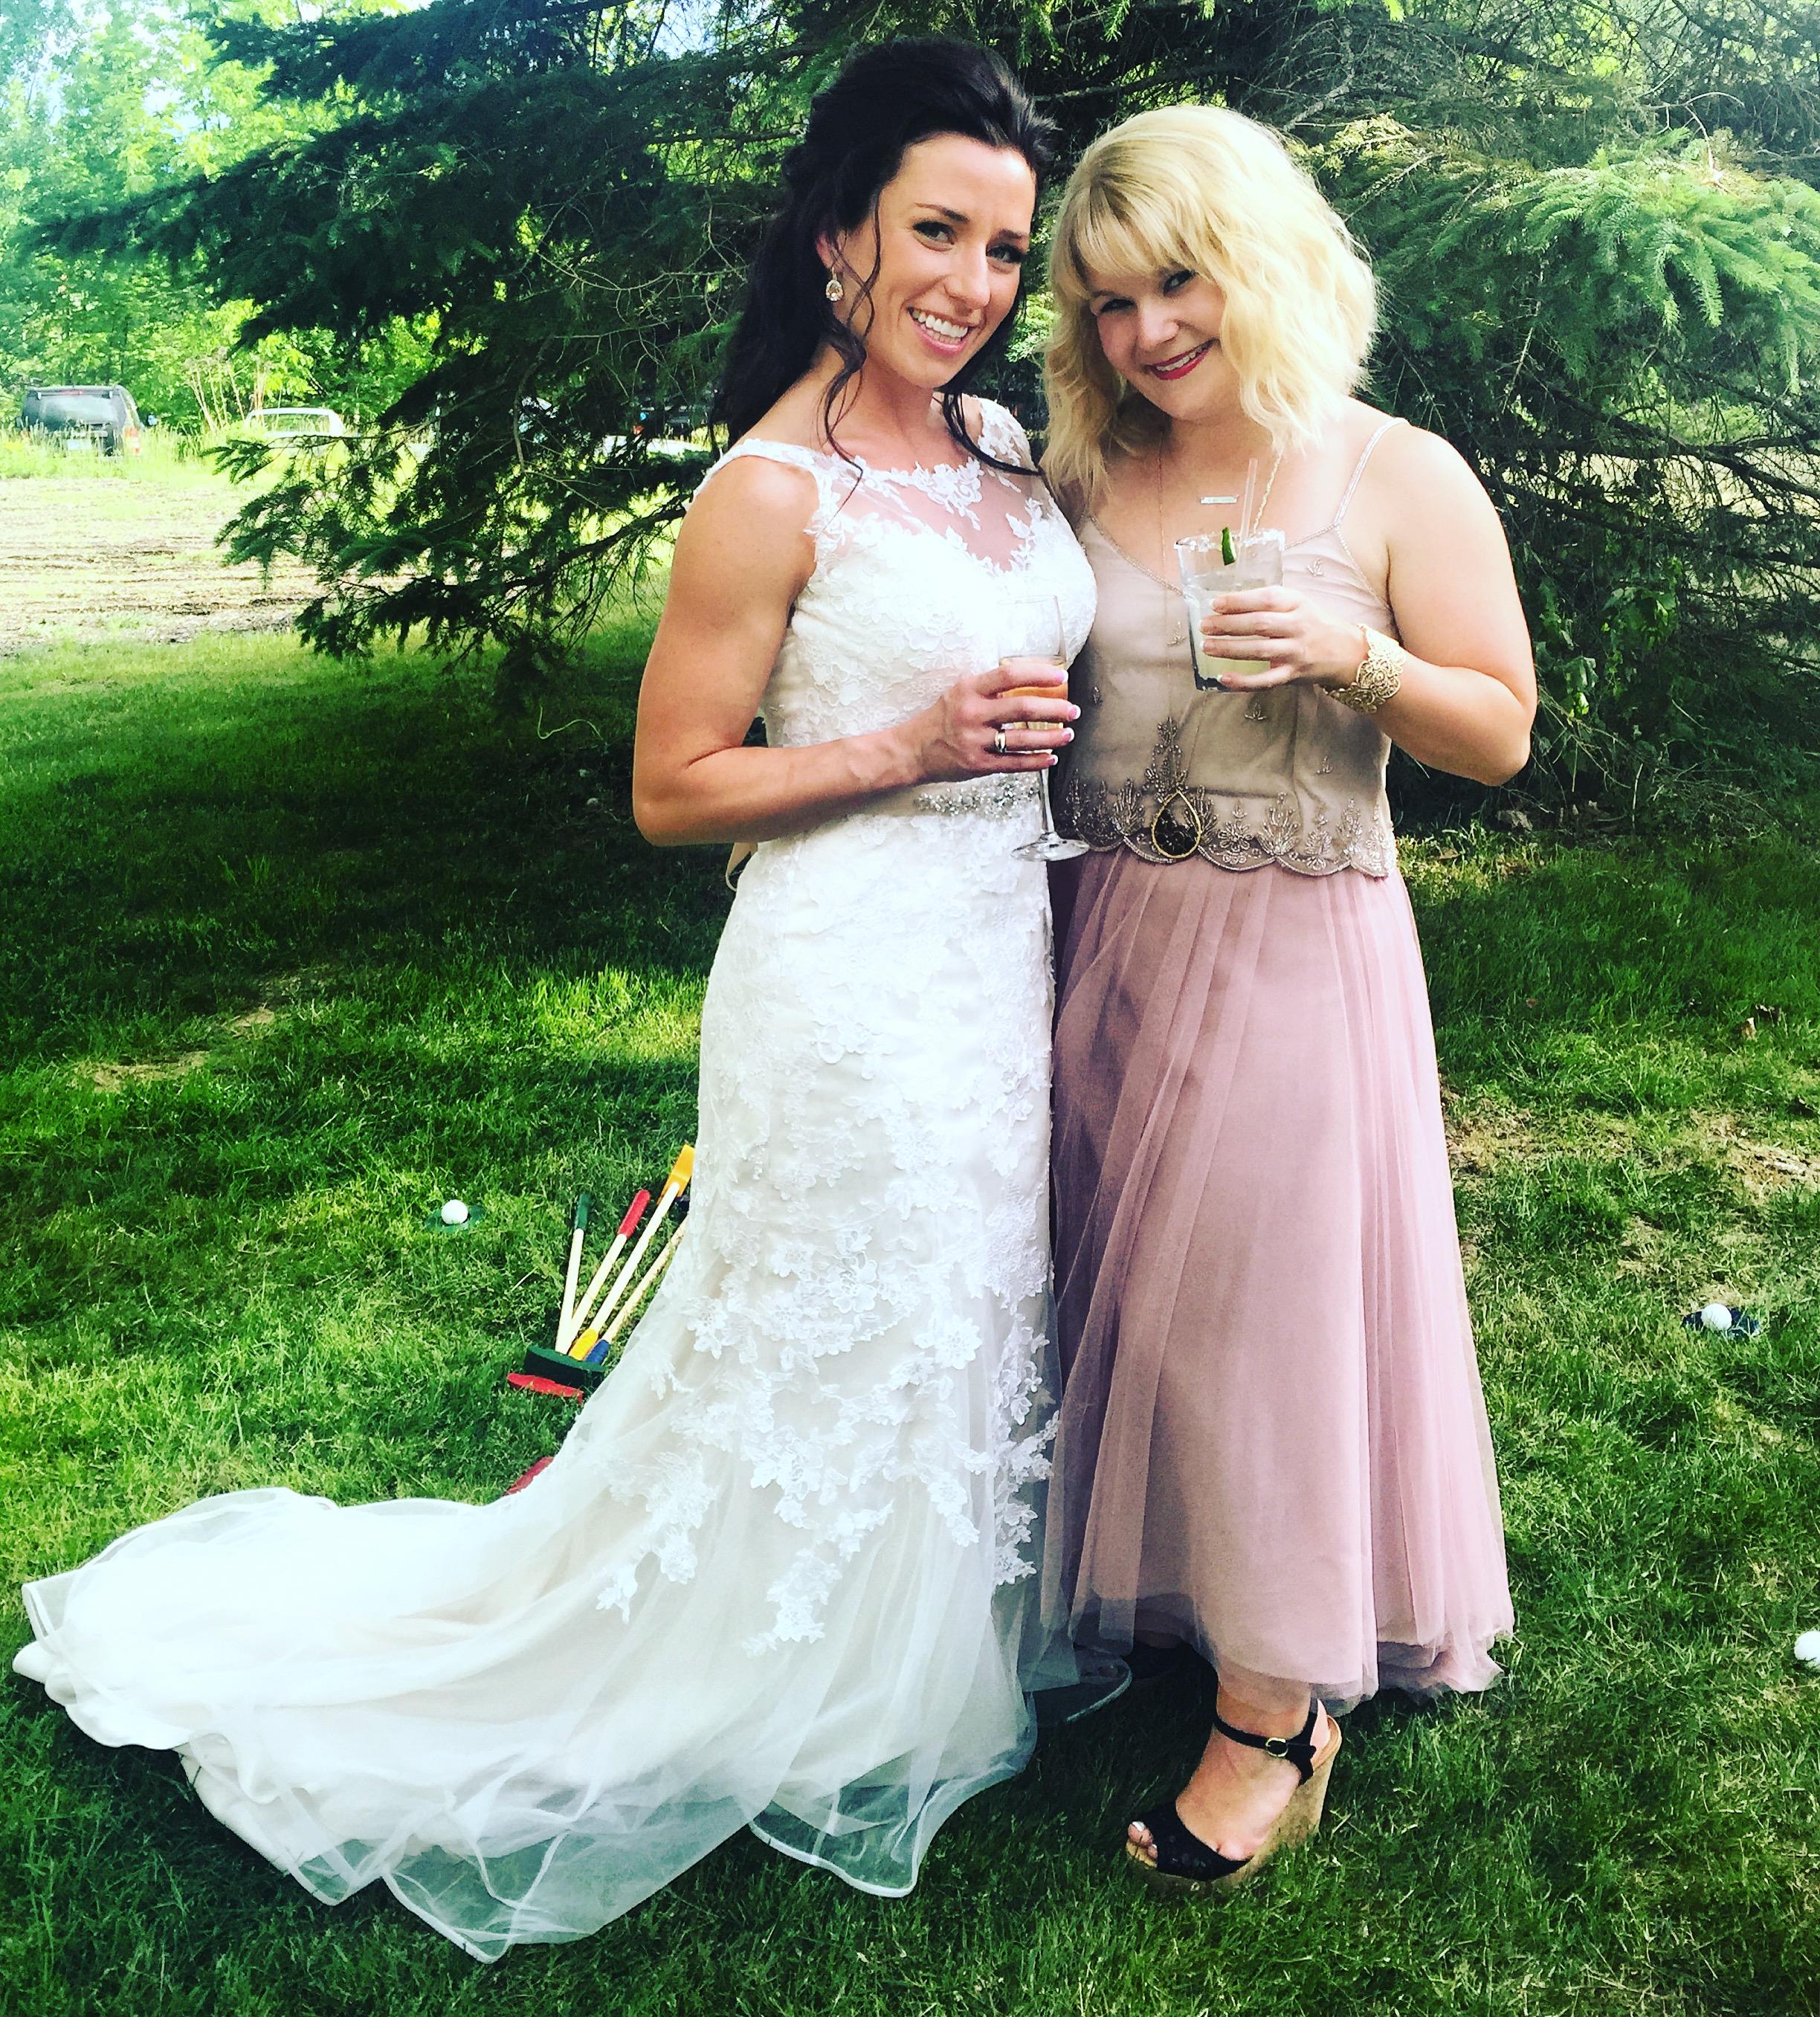 A Wedding Tale Ending